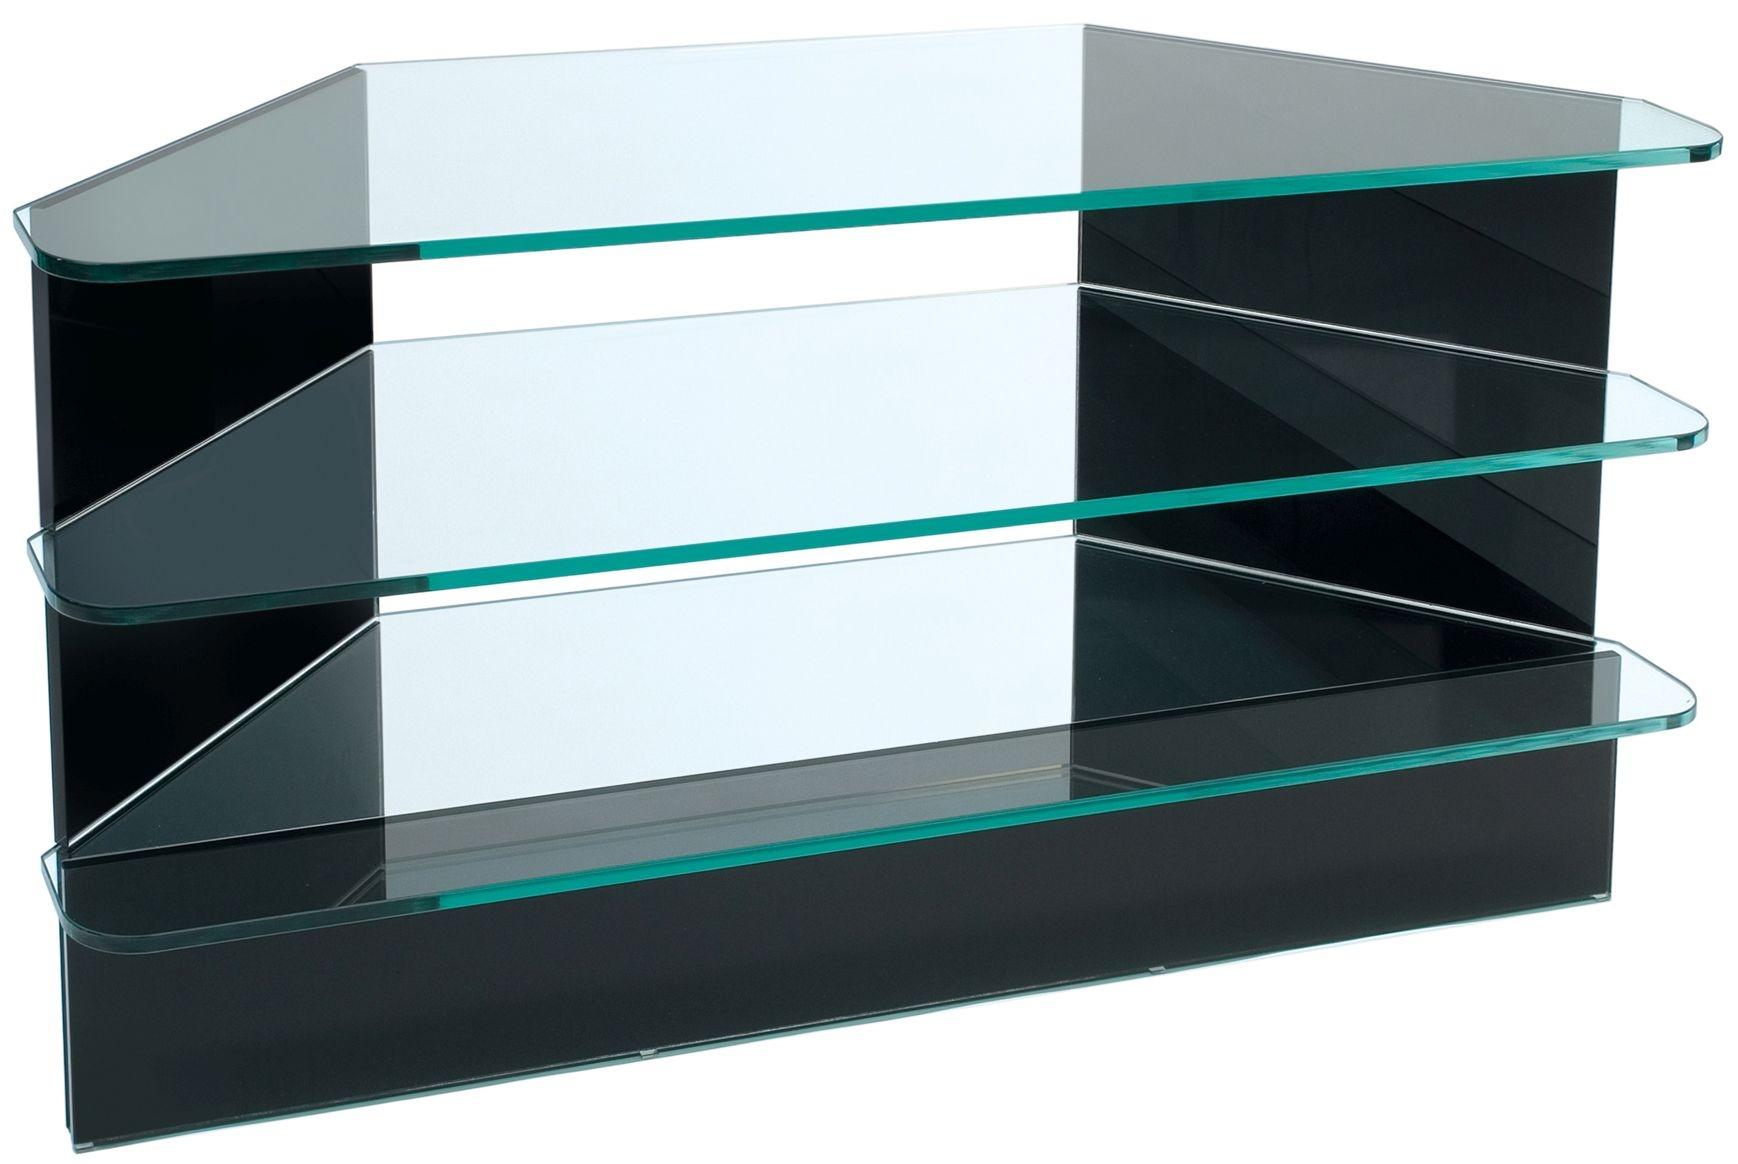 Greenapple Pure Glass Plasma TV Stand - Black 59293HZW